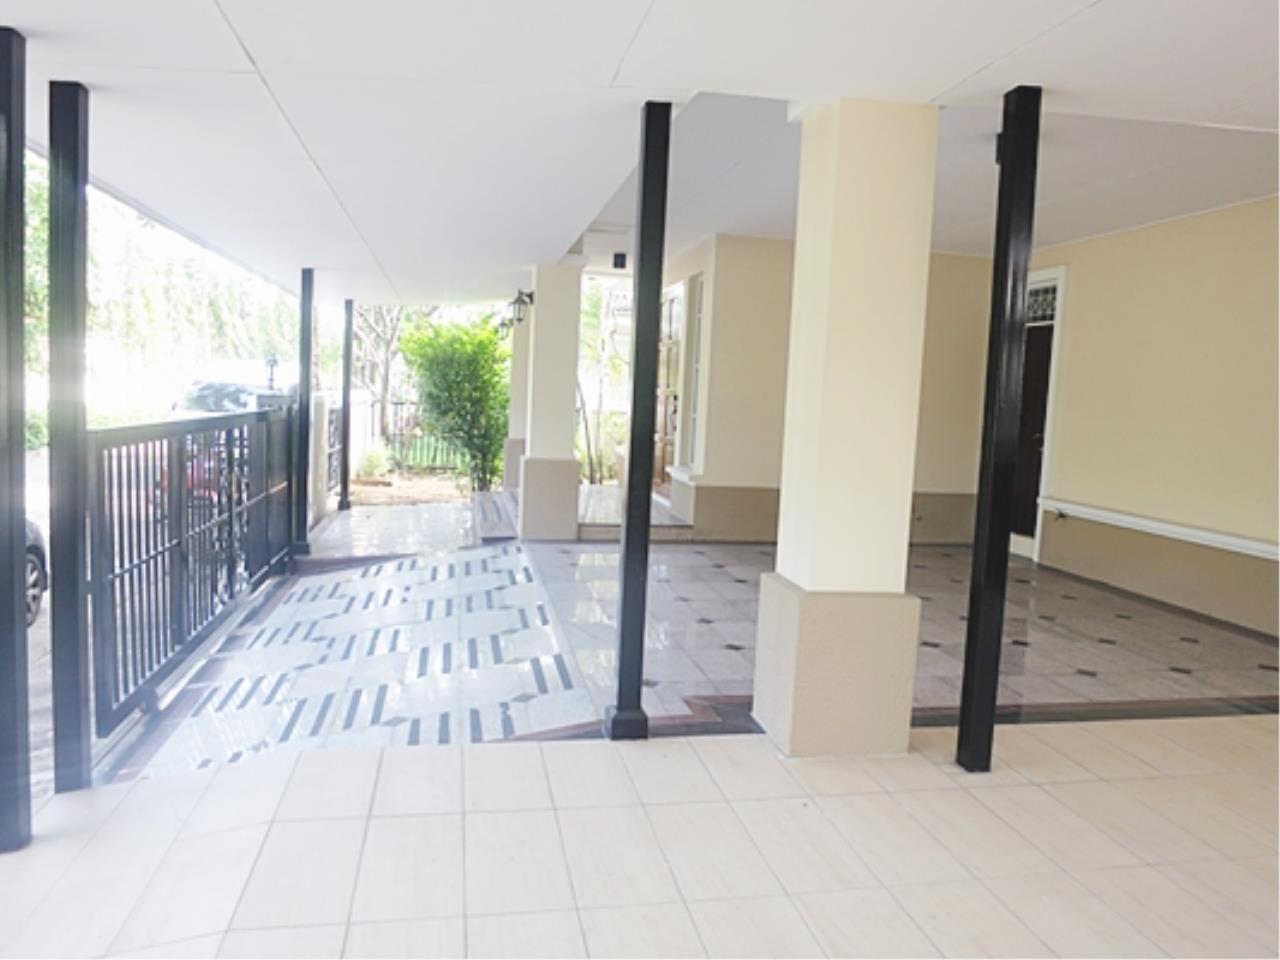 Estate Corner Agency (Samut Prakan) Agency's Single house for sale Ladprao, fully furnished. 25